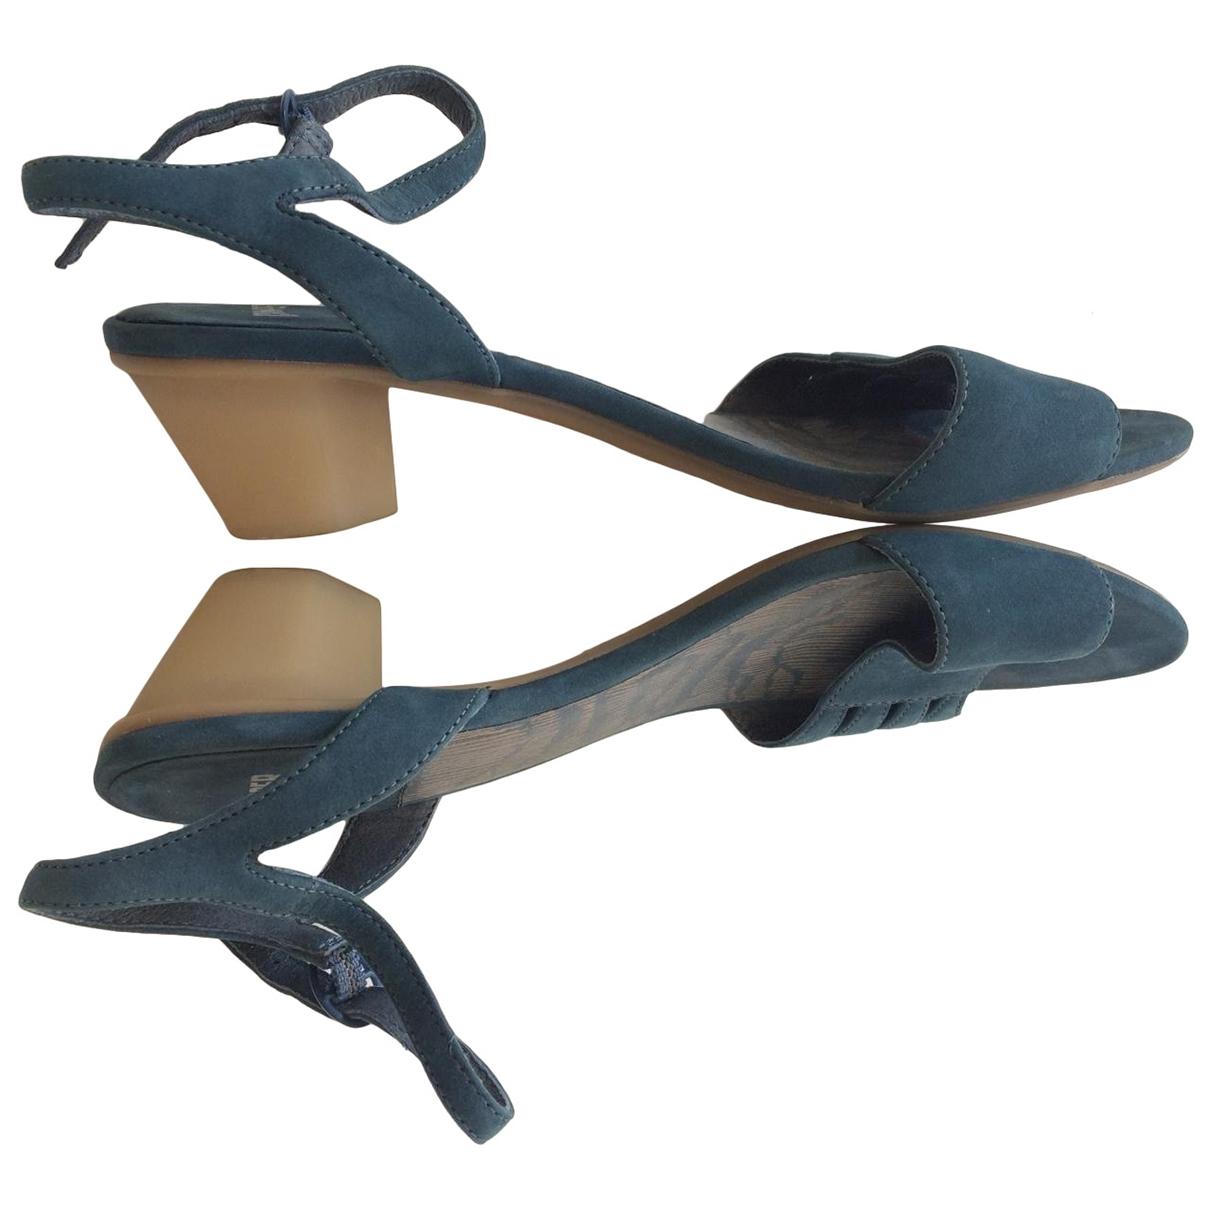 Sandalias romanas de Cuero Camper